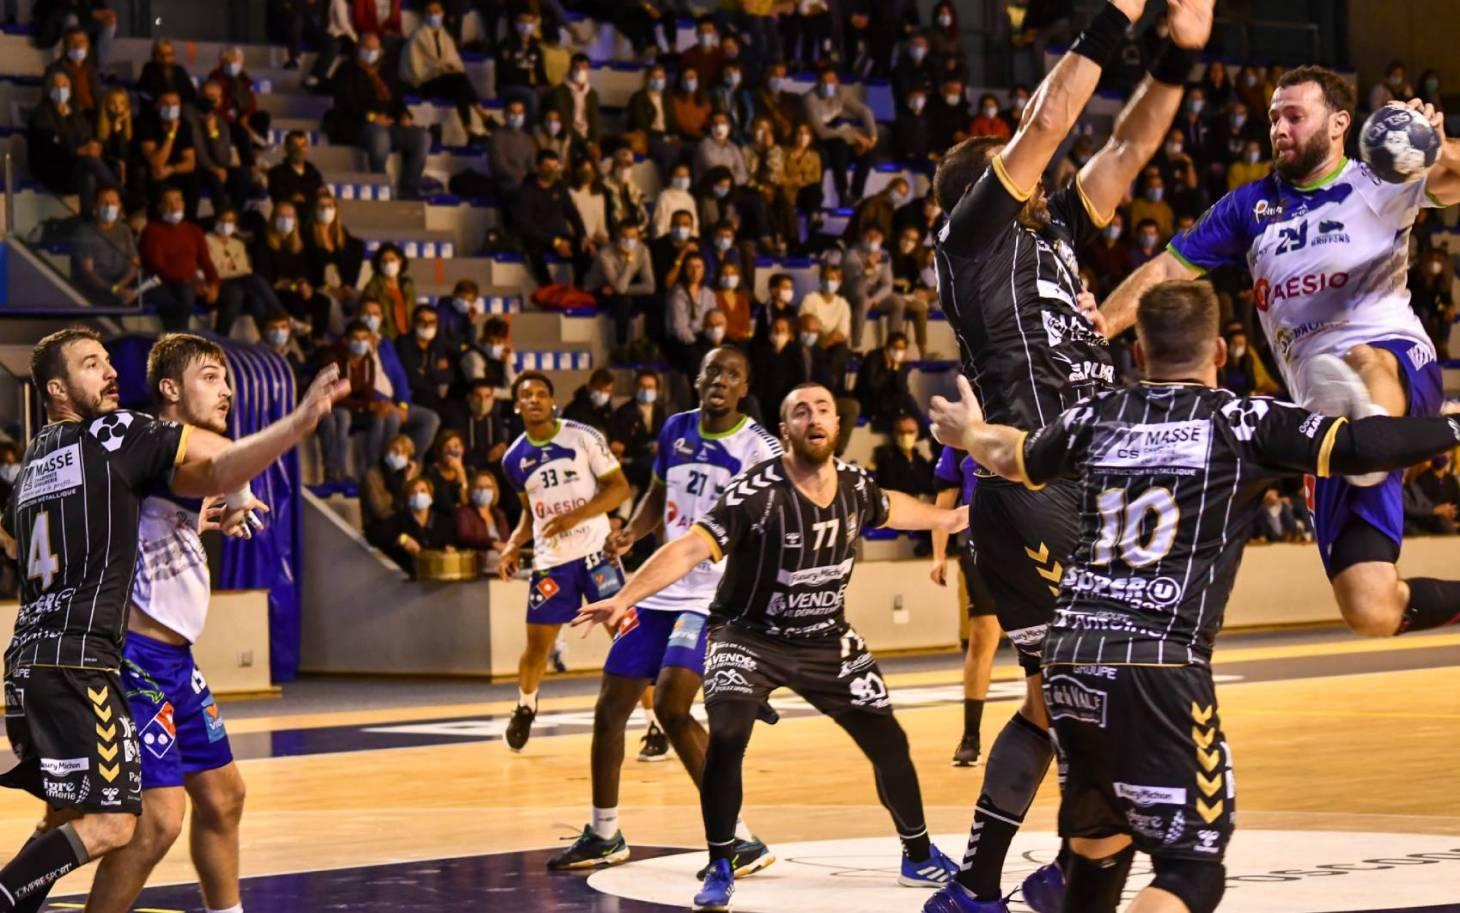 Handball - Grand Poitiers dans l'Elite